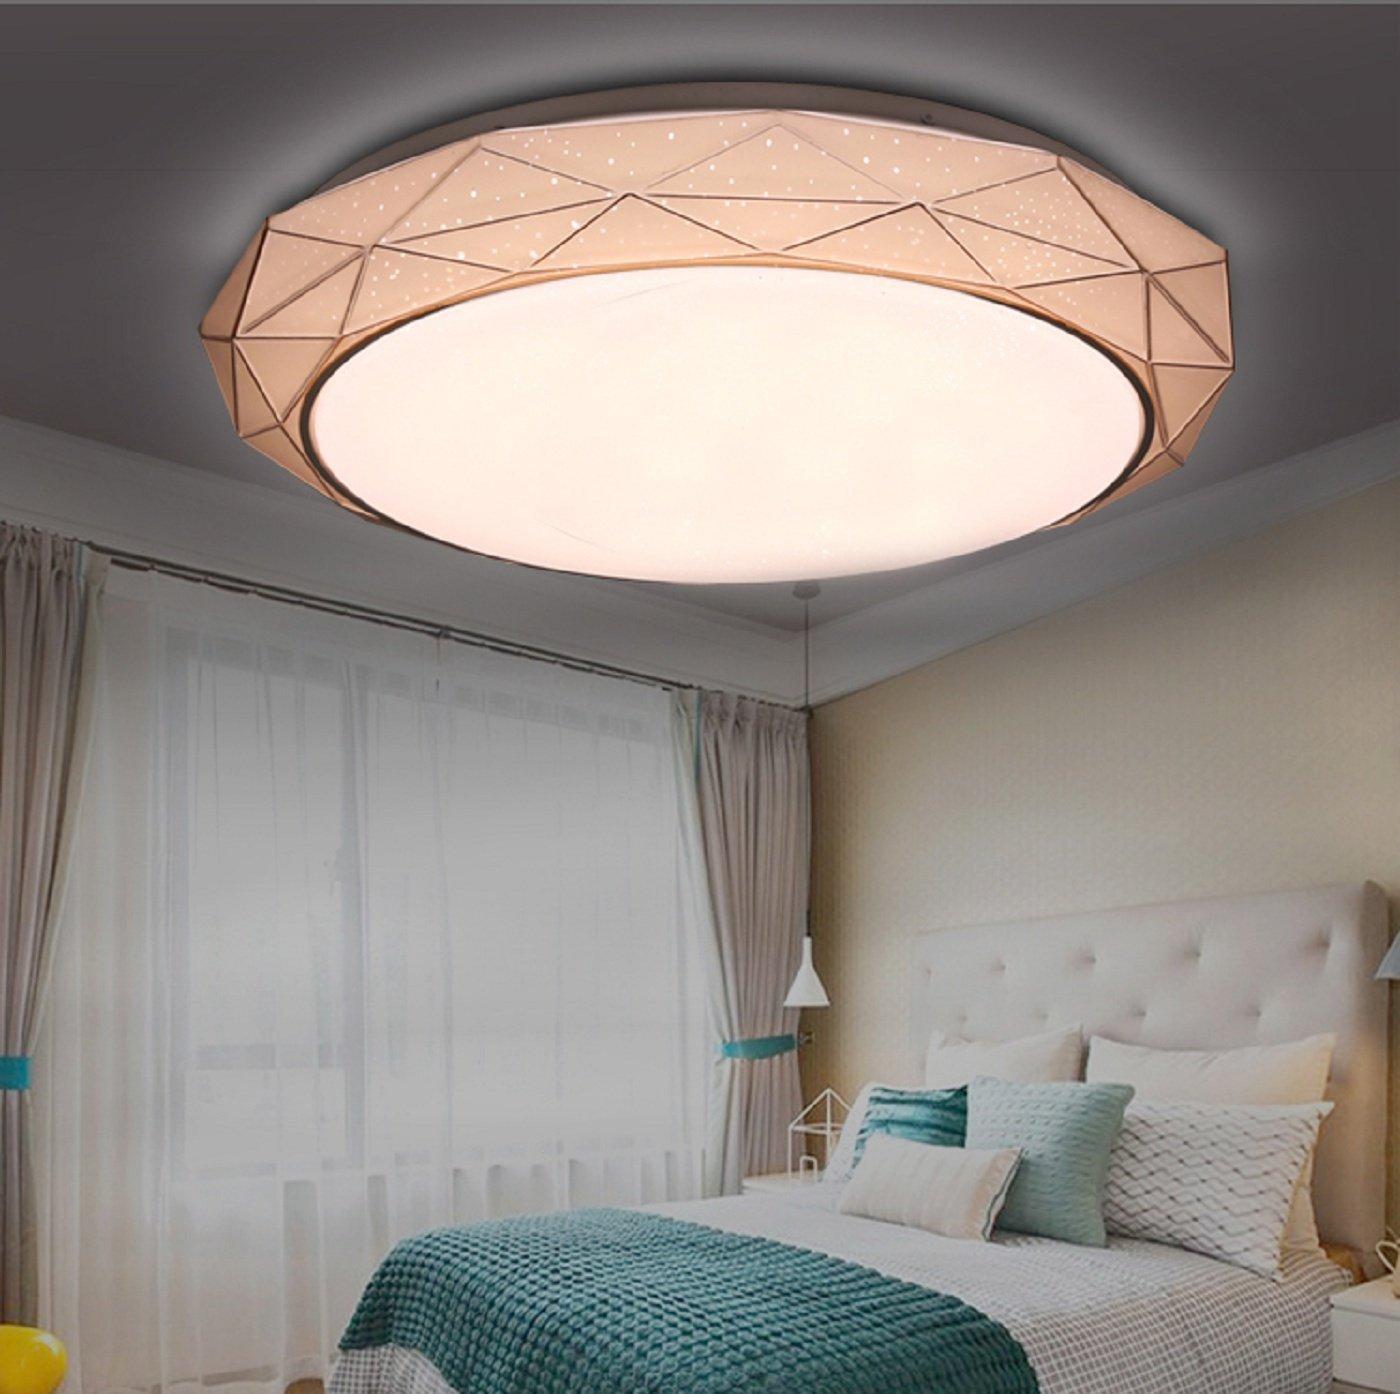 Nuevo Diseñador nórdico PVC sombra geométrica lámpara ...